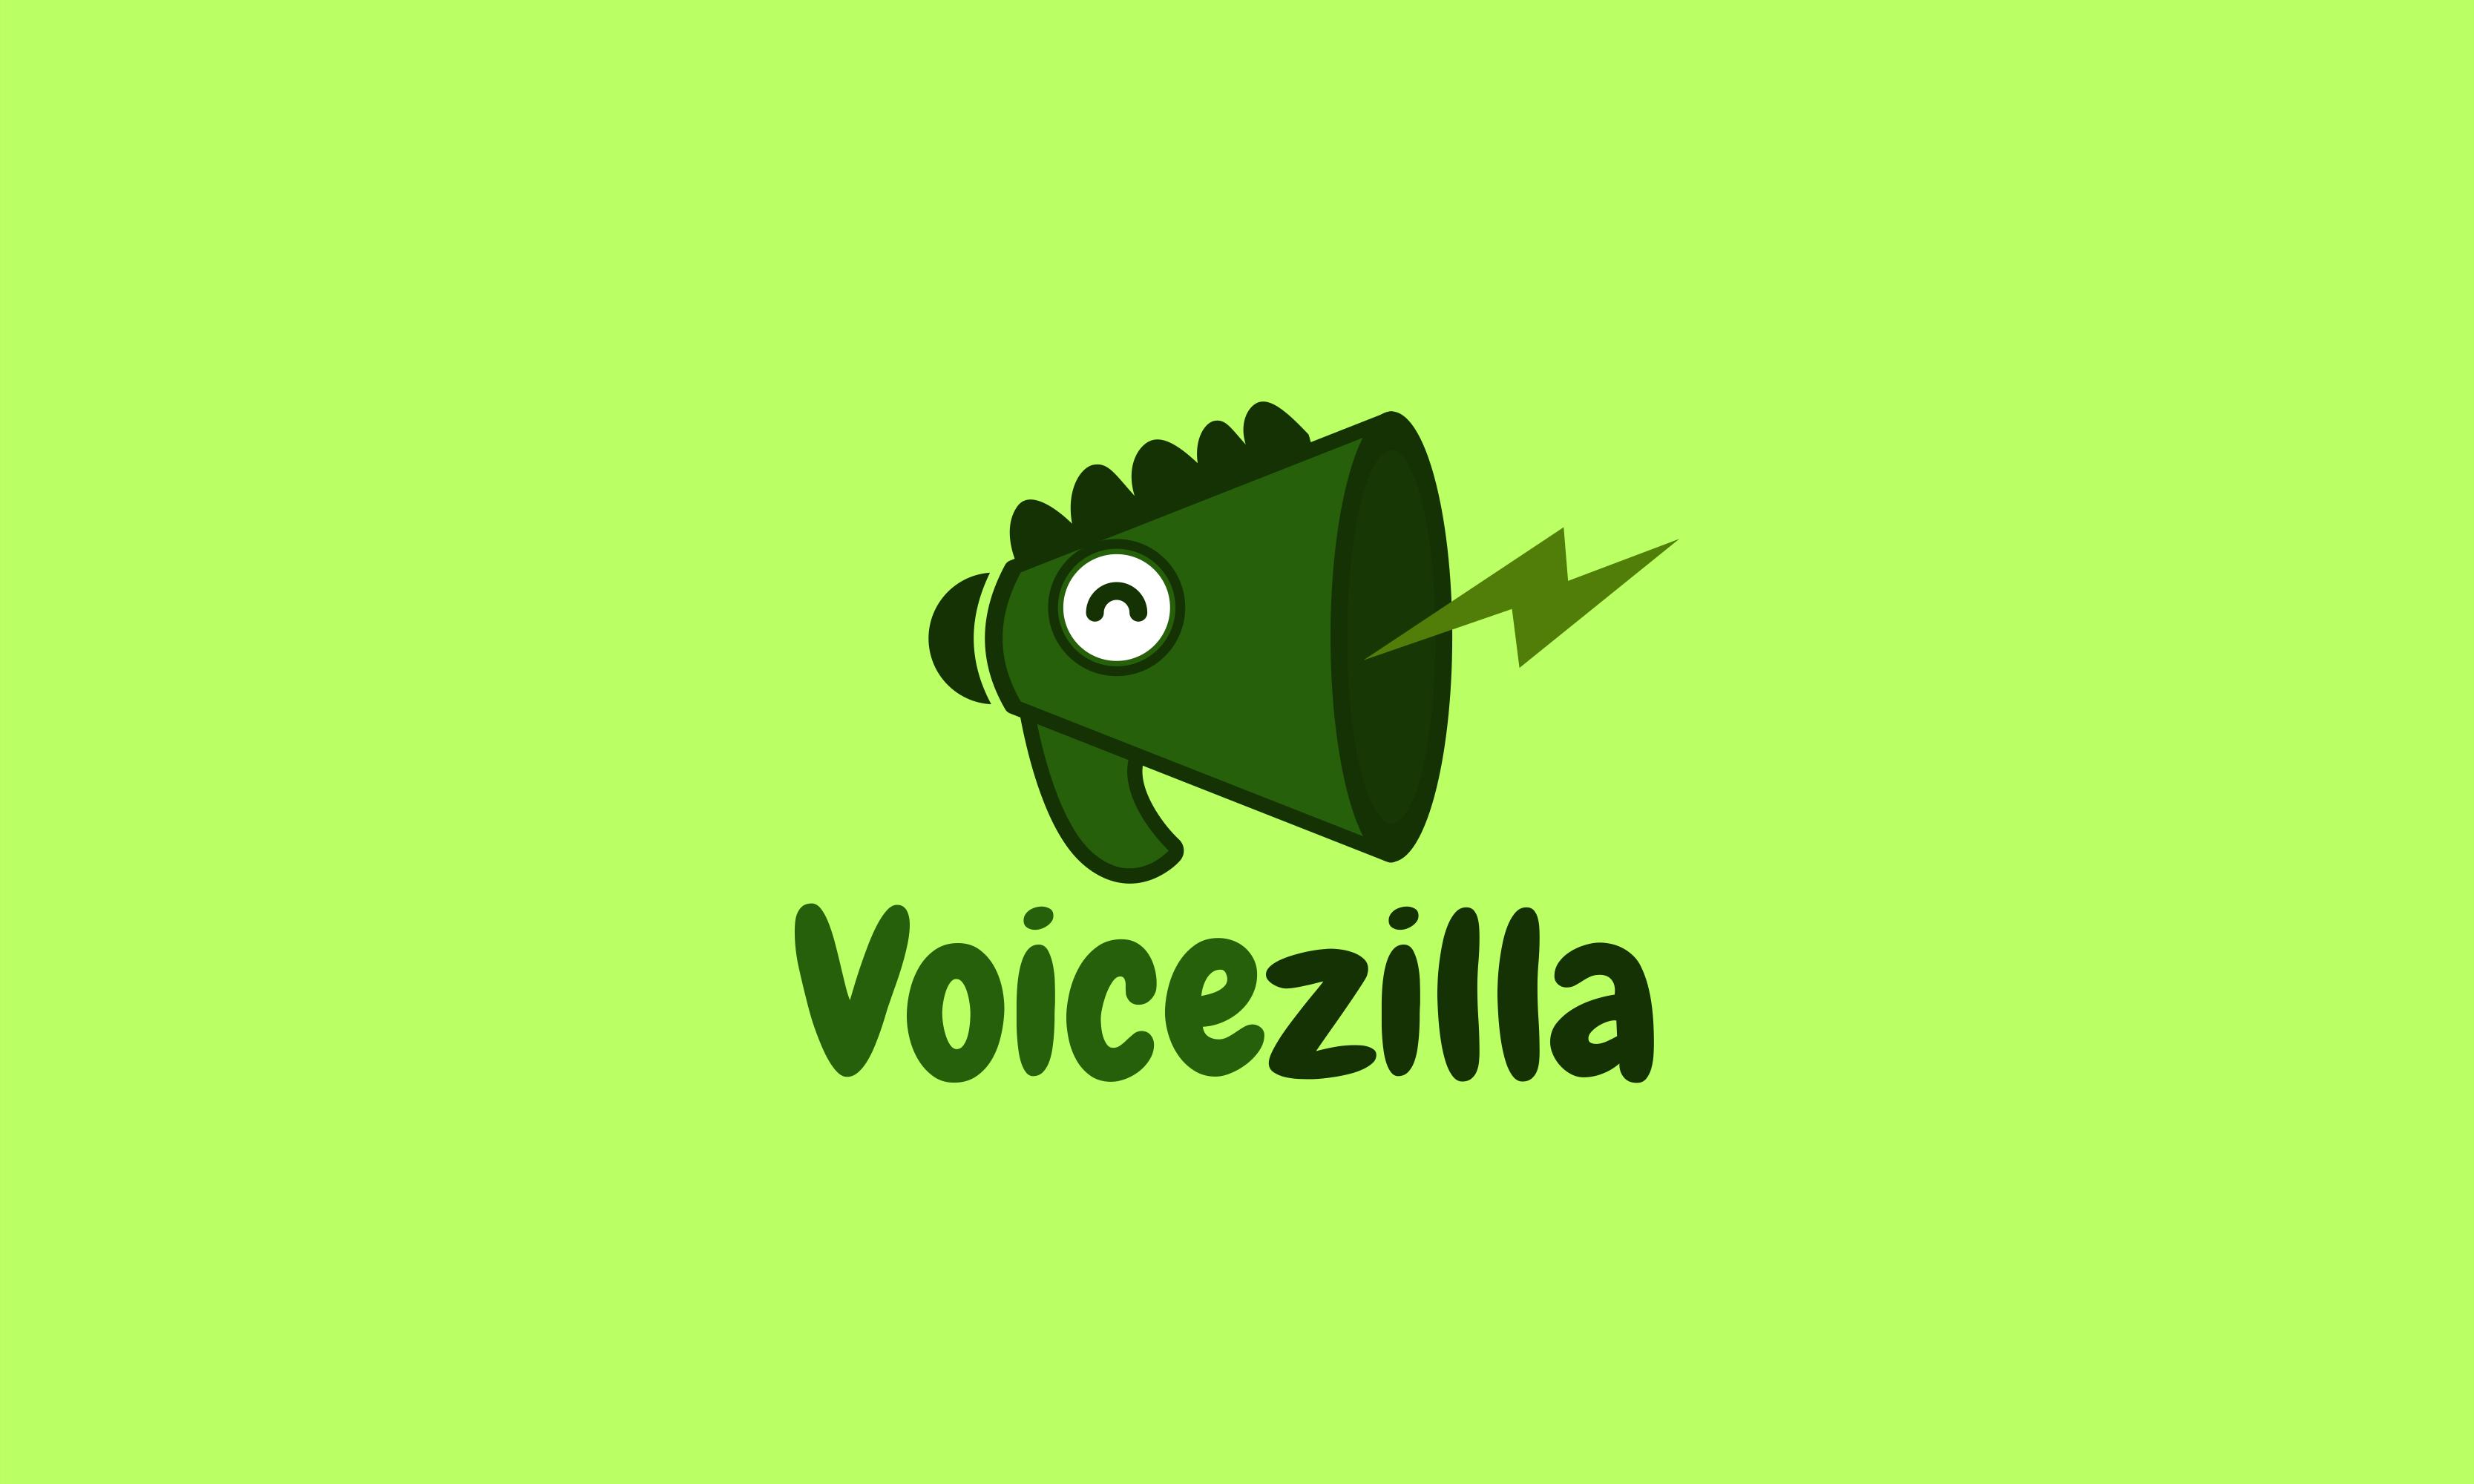 Voicezilla - Audio startup name for sale